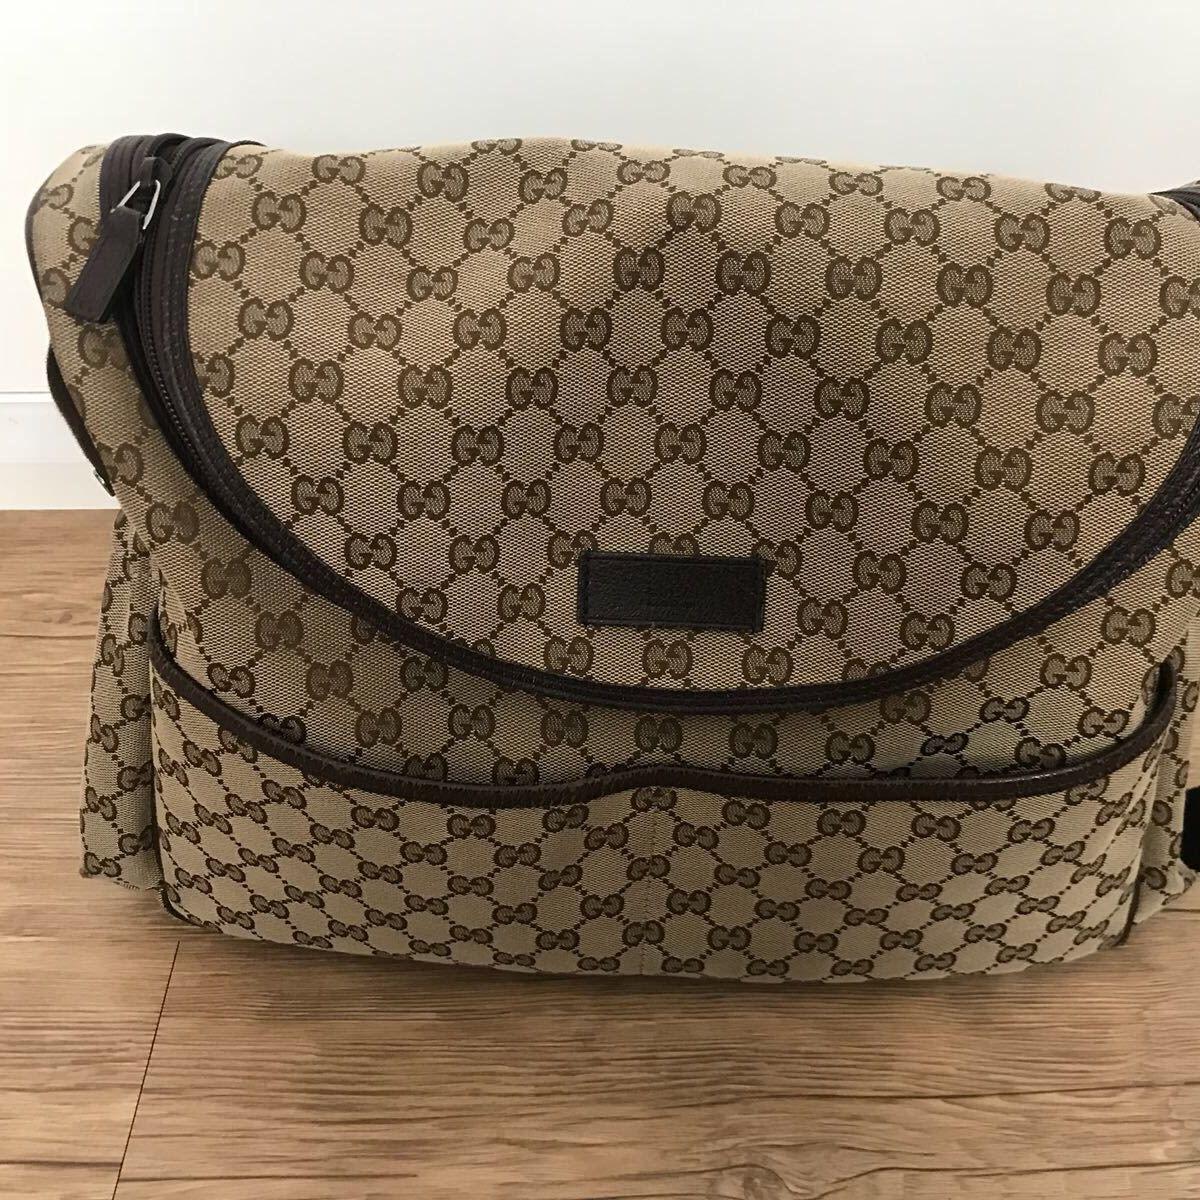 2766a7c6c Bolsa P Bebe Gucci | Bolsa de Ombro Feminina Gucci Usado 29561284 | enjoei